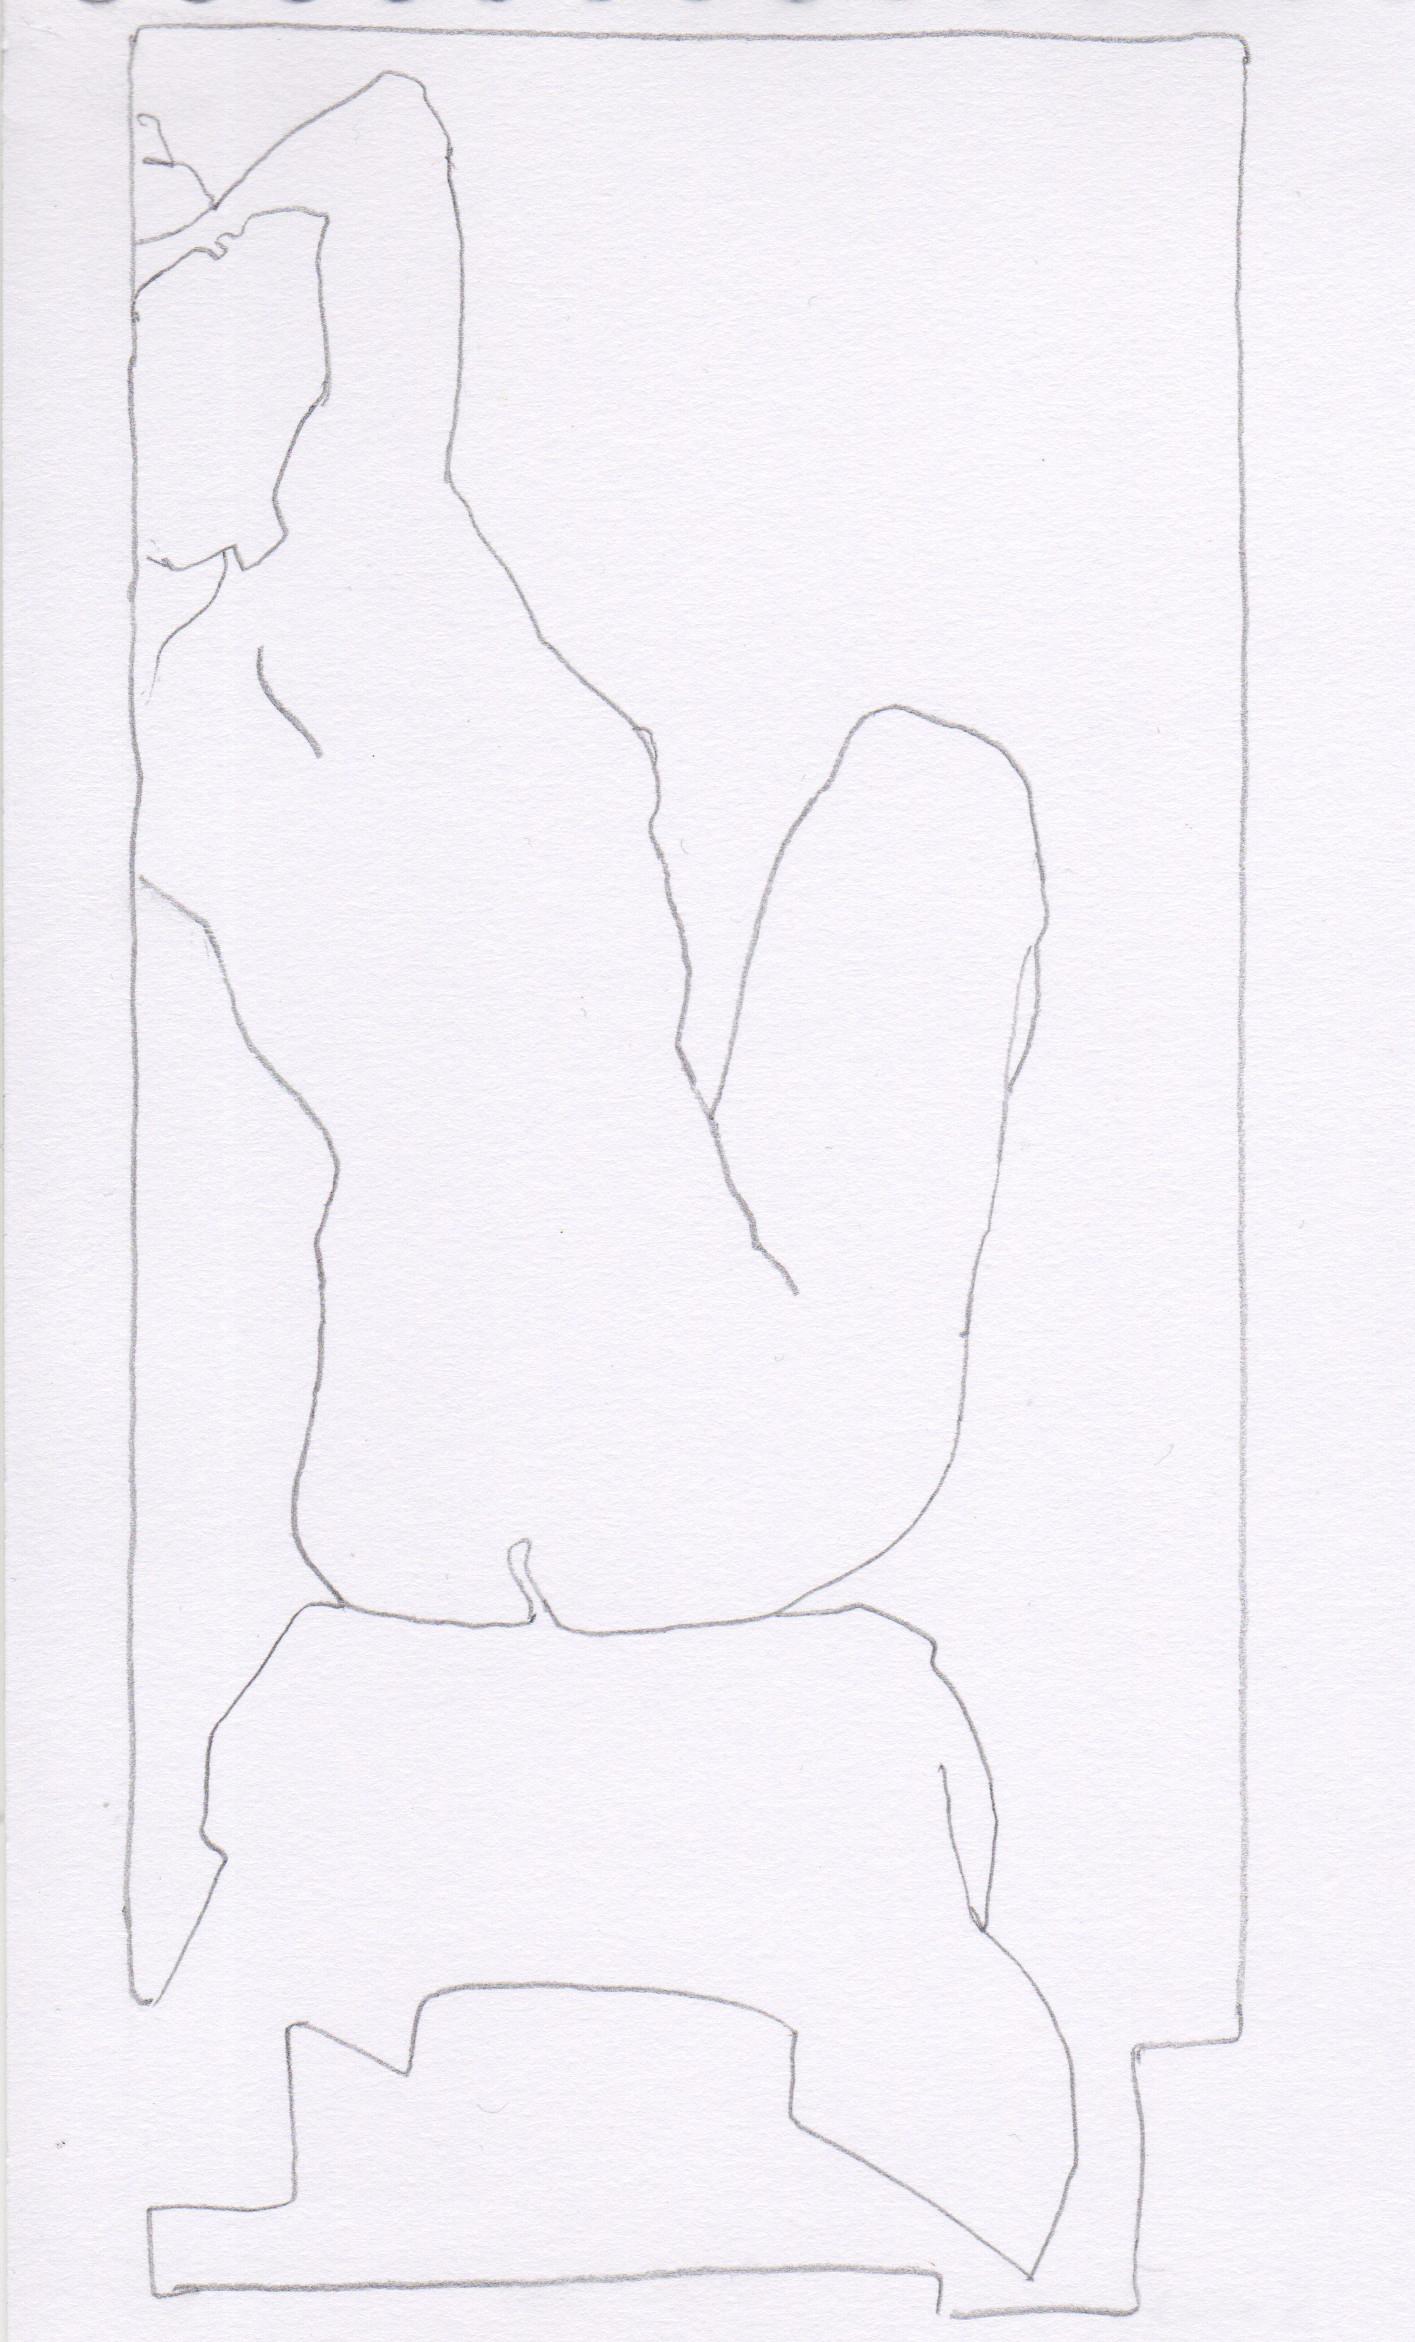 2015_Sketch_F-Beudin_04